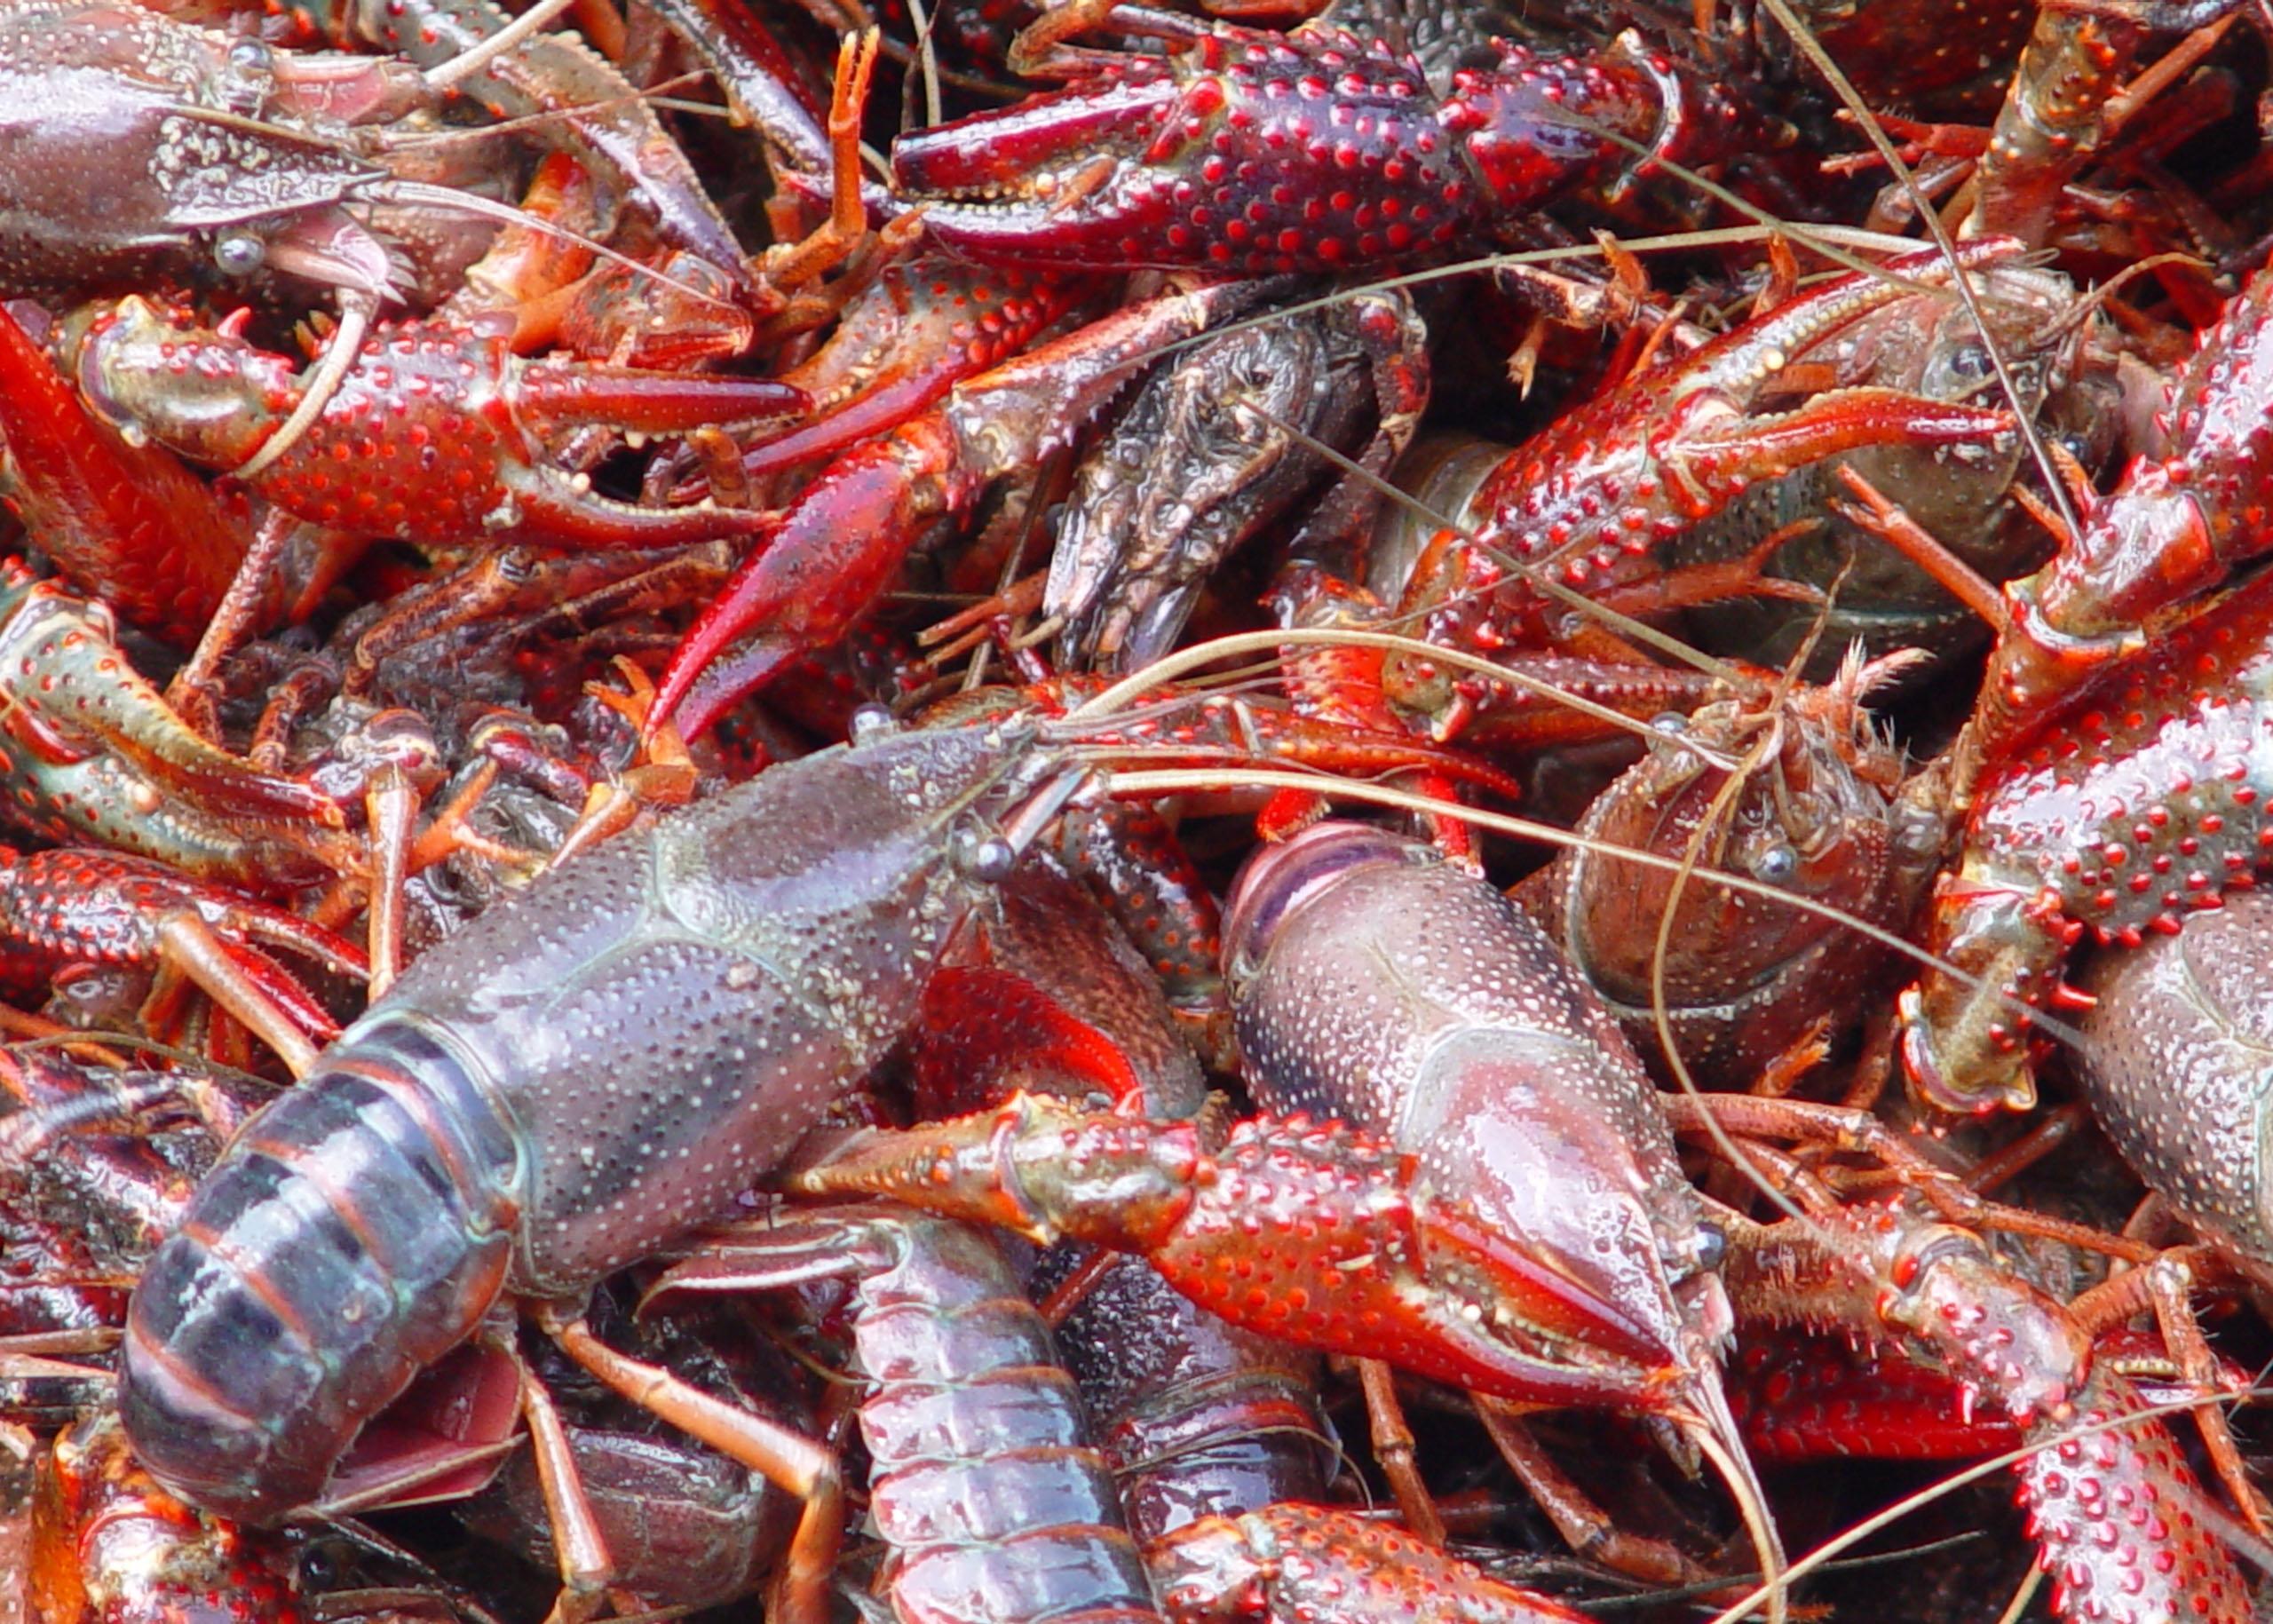 Evolution of the Louisiana Crawfish Industry